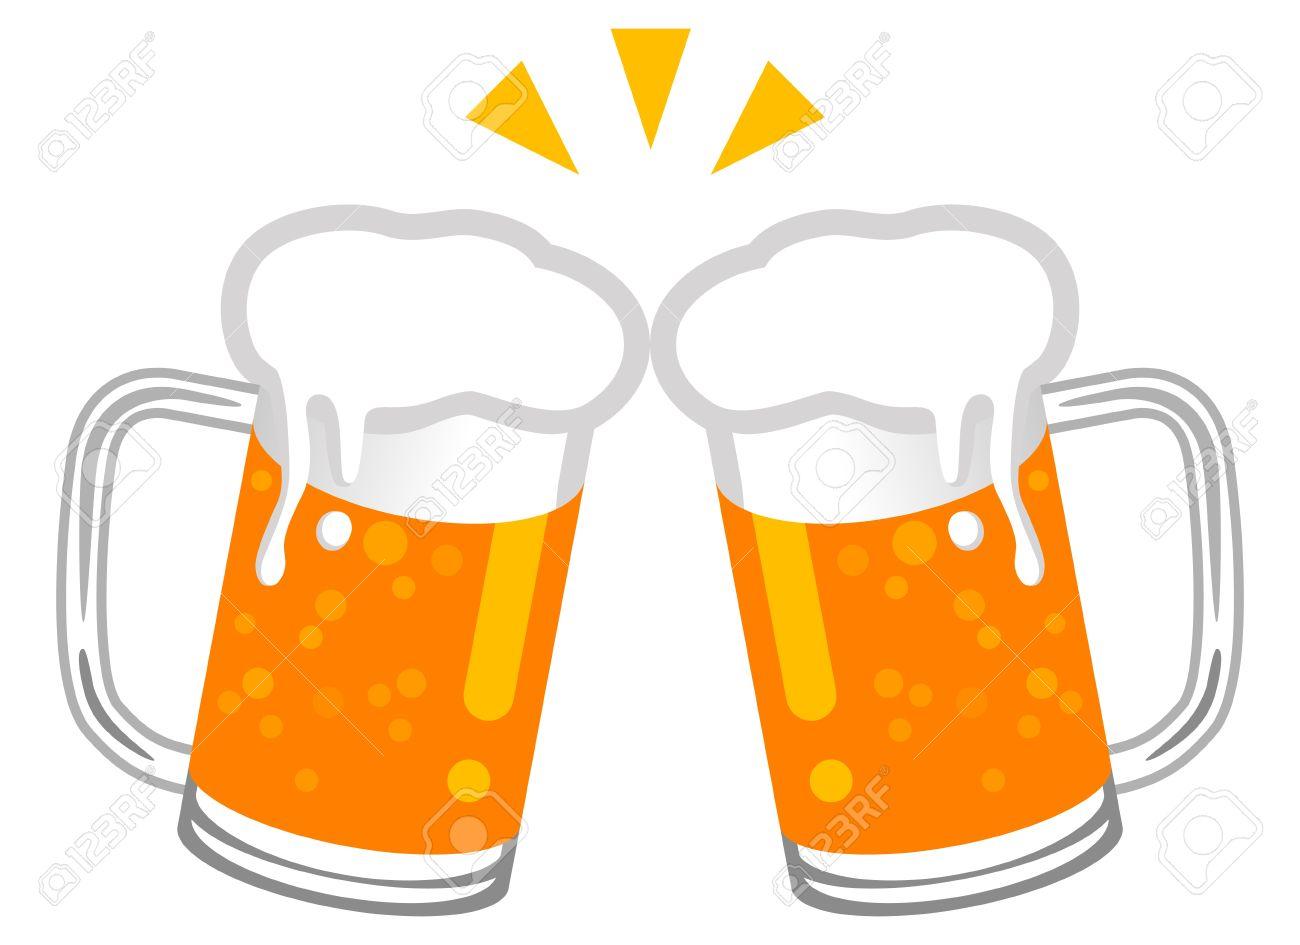 Cheers beers clipart.